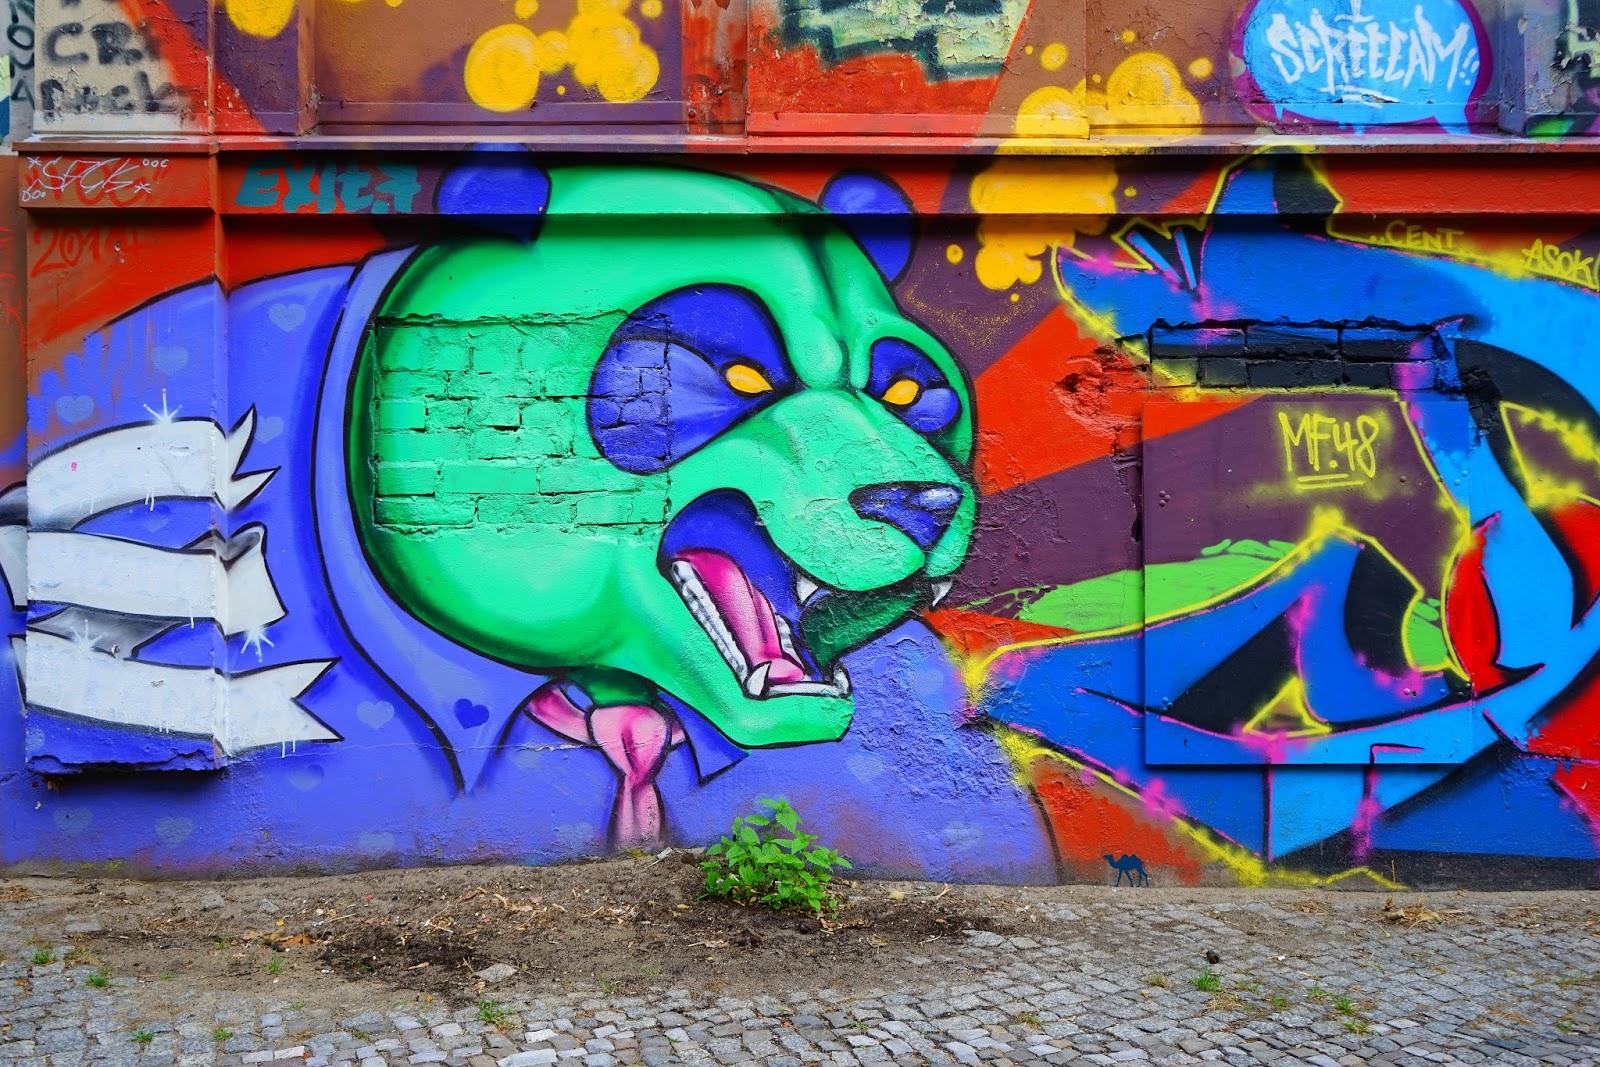 Le Chameau Bleu - Street Art - Angry Panda - escapade à Berlin